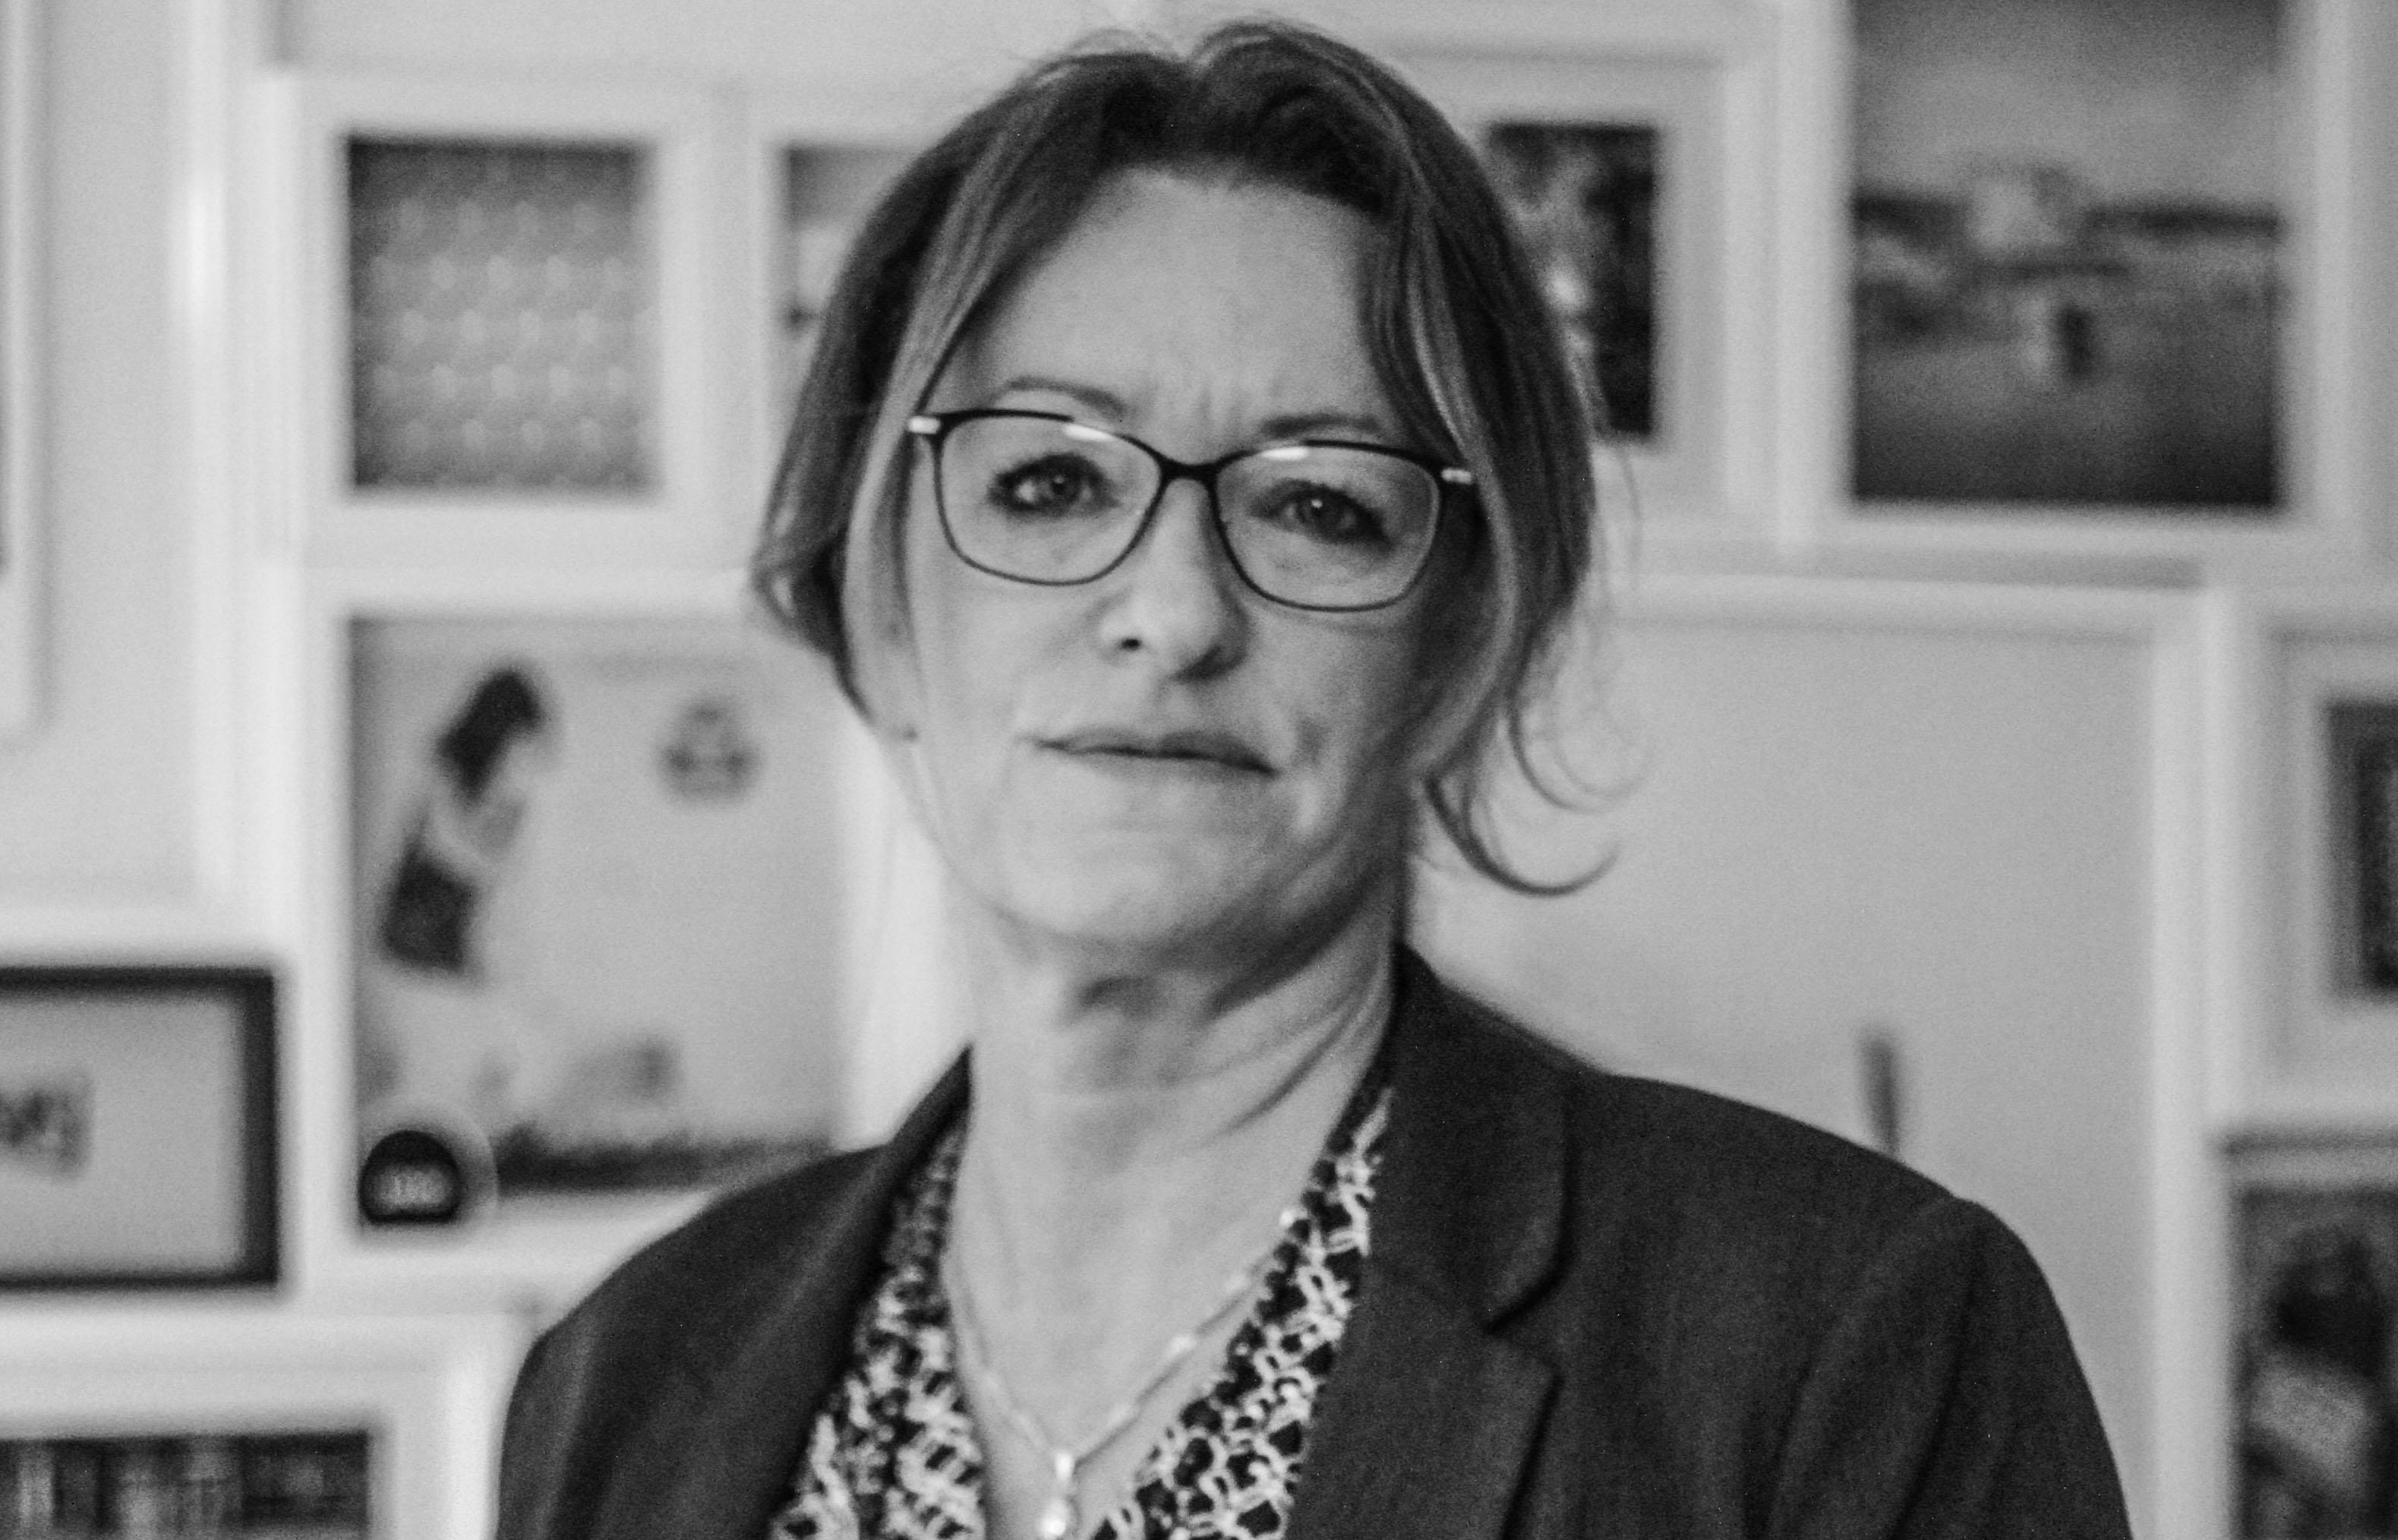 HHOTR Manuela Walther tide heute ein engel podcast